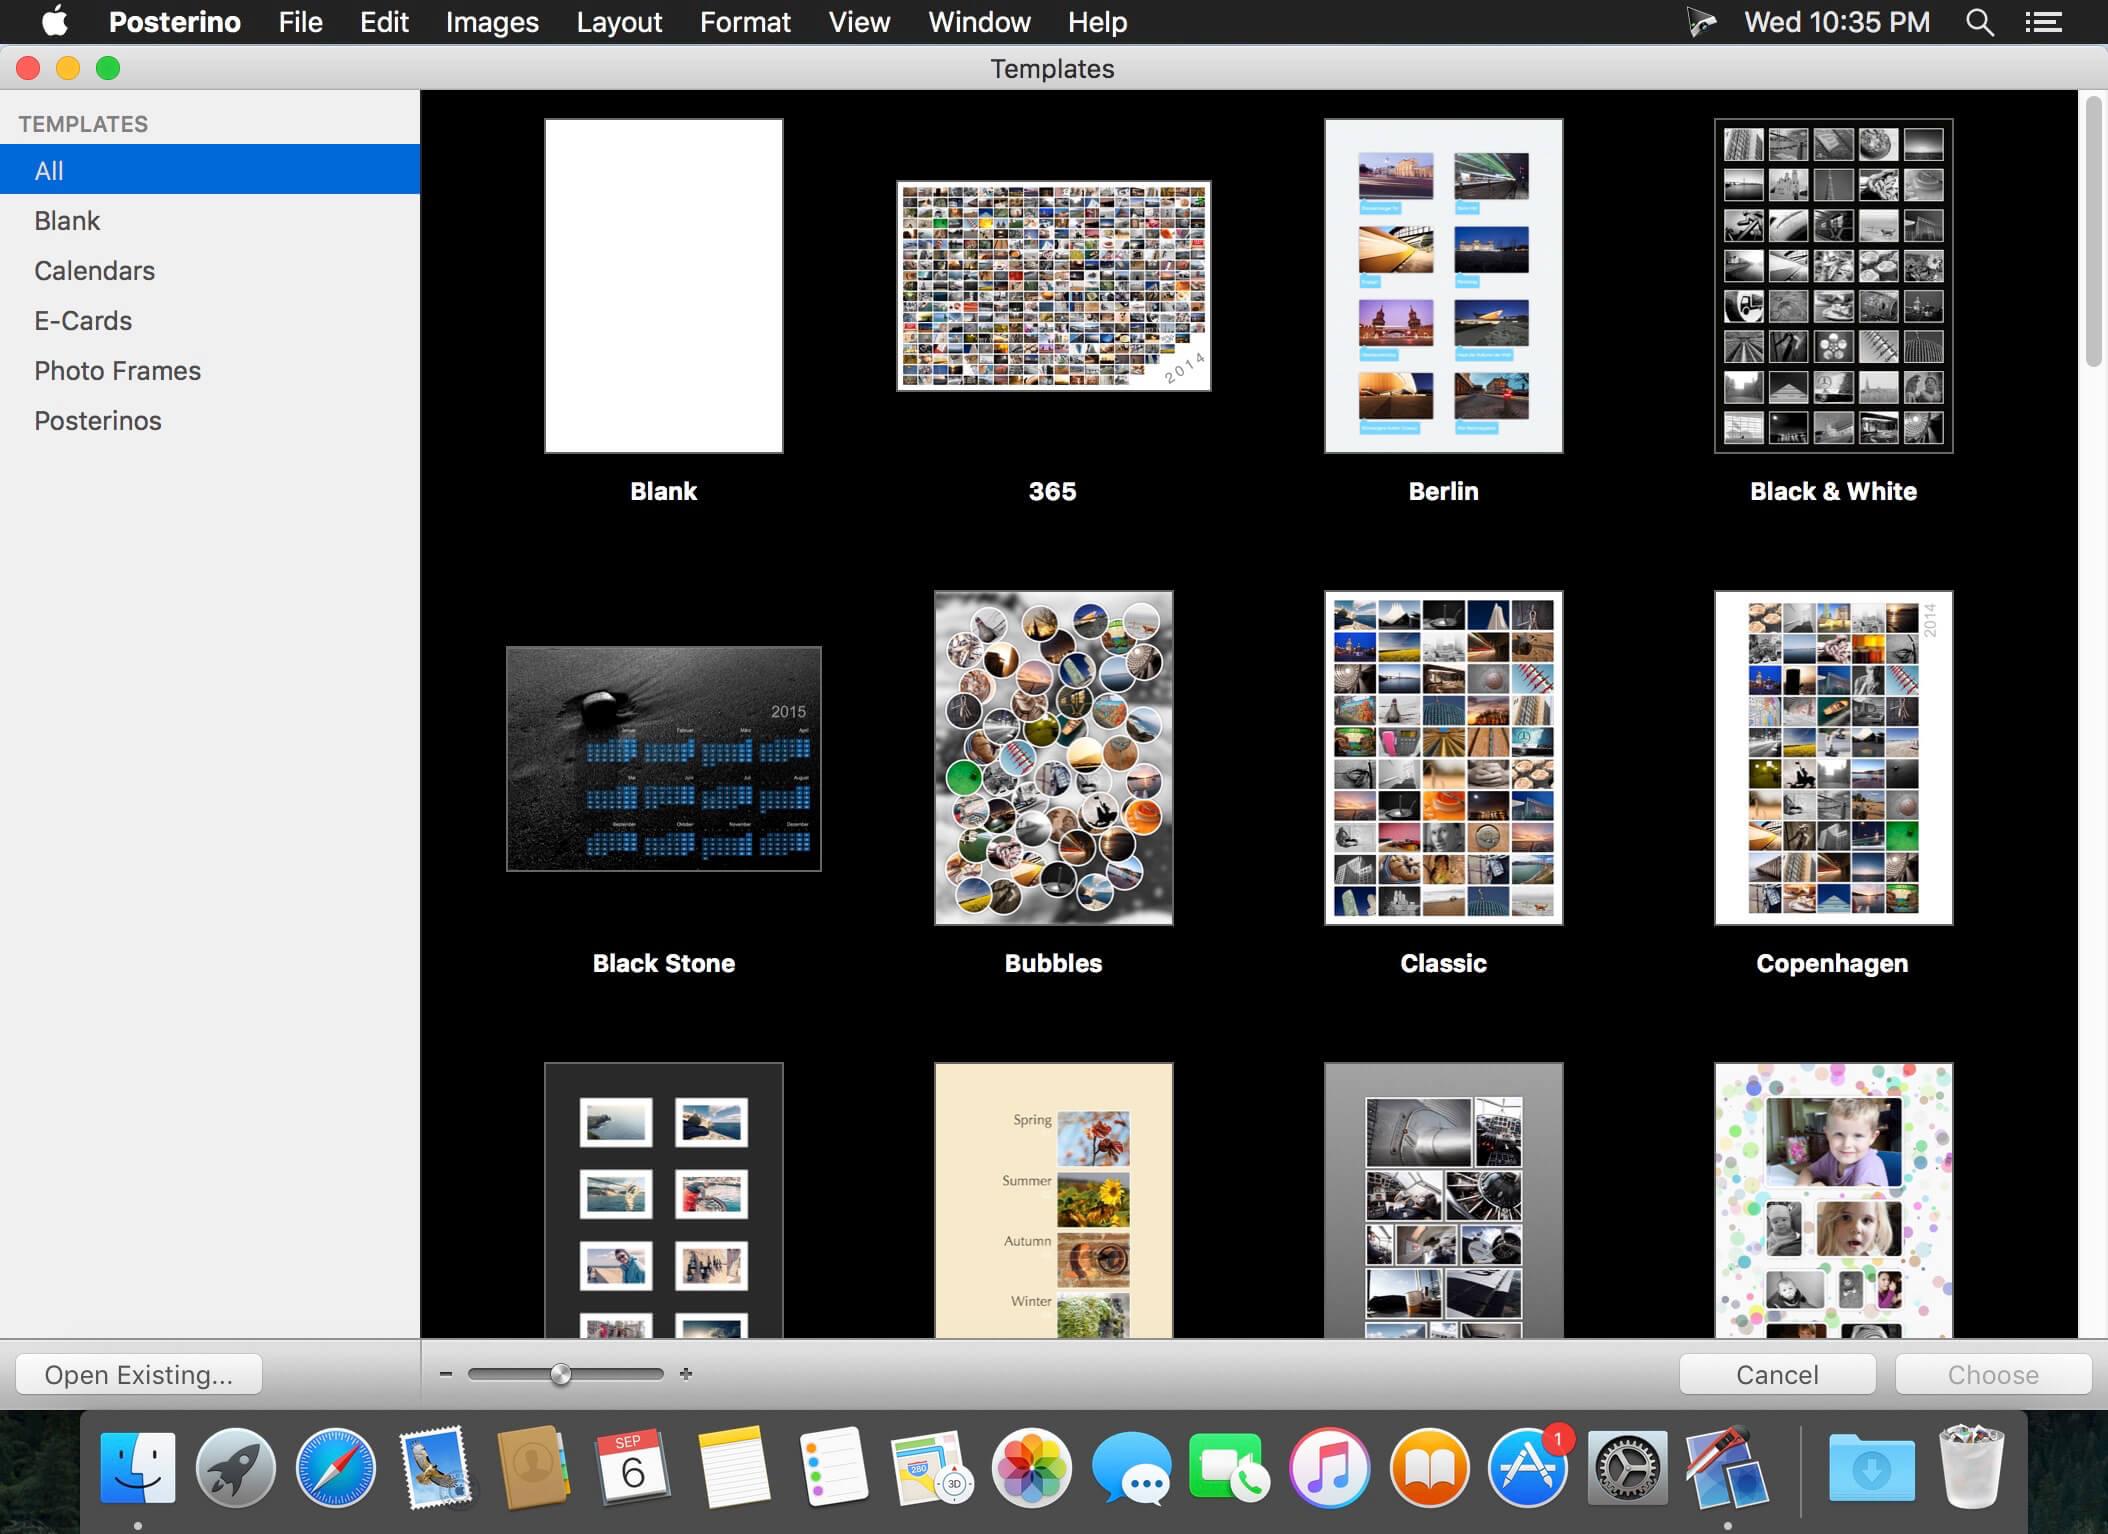 Posterino-3.8.4-for-Mac